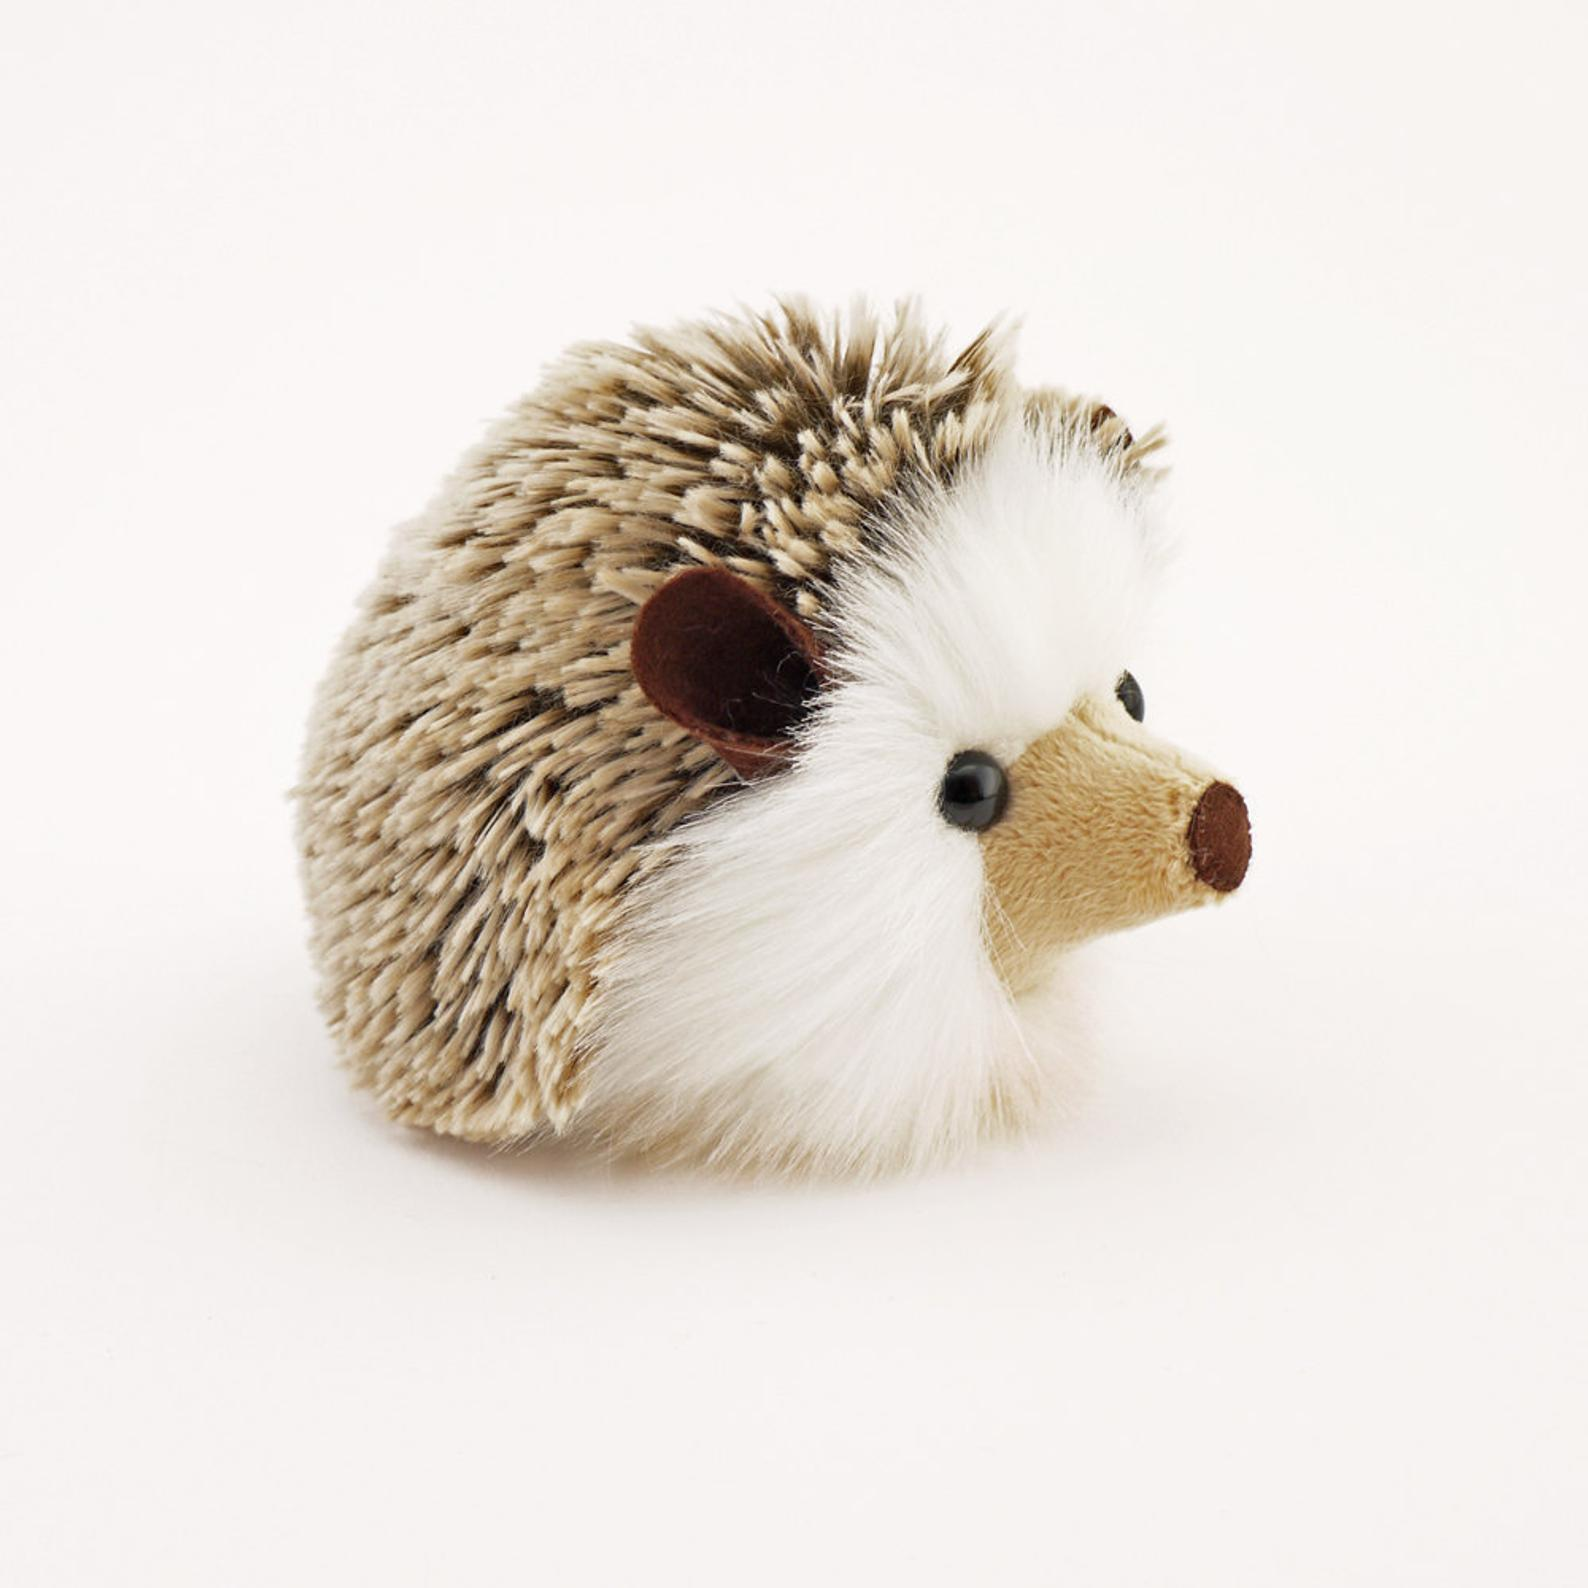 stuffed hedgehog from etsy